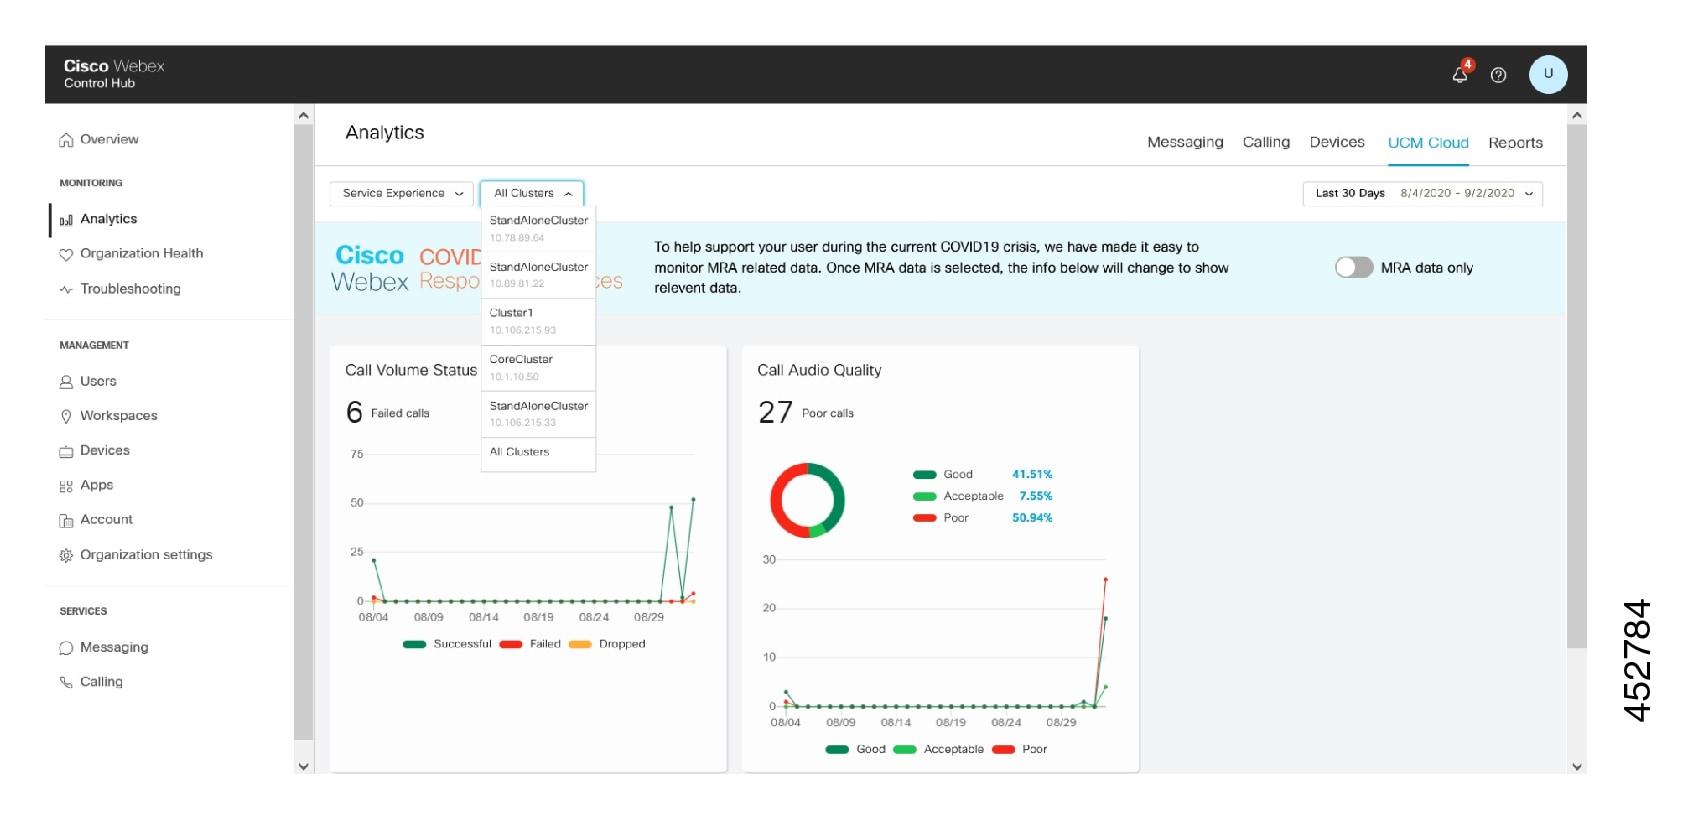 Cisco UCM Cloud 분석